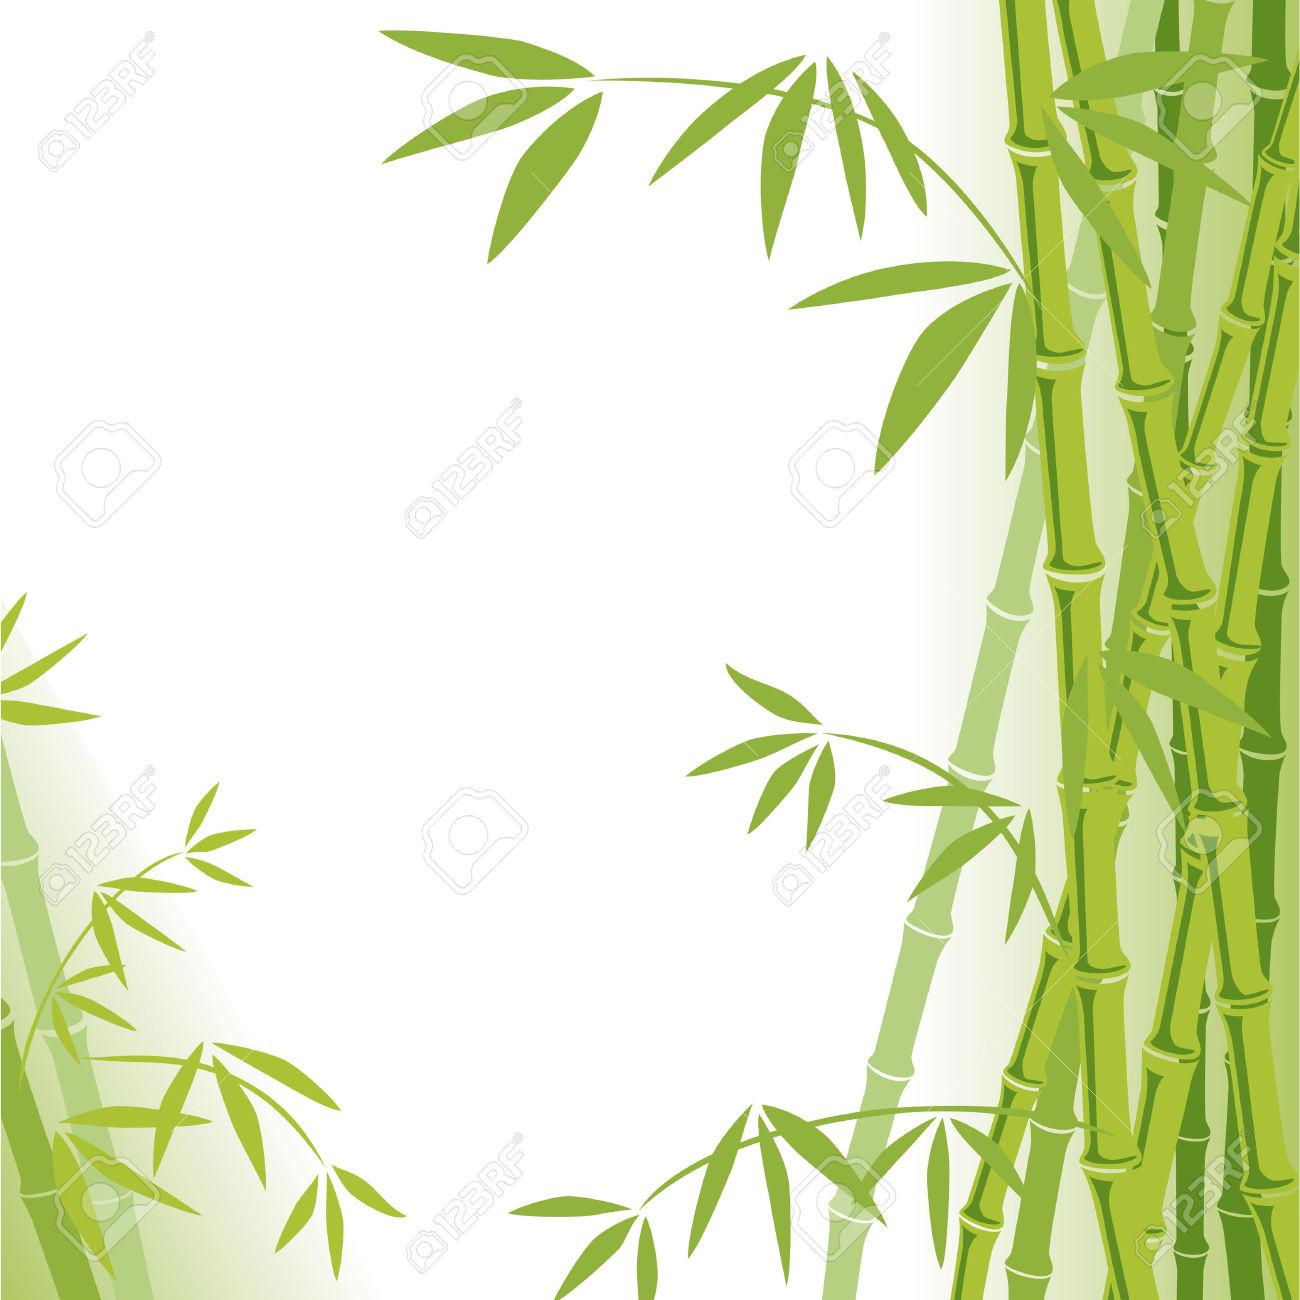 Img clipartxtras com b. Bamboo clipart bamboo shoot